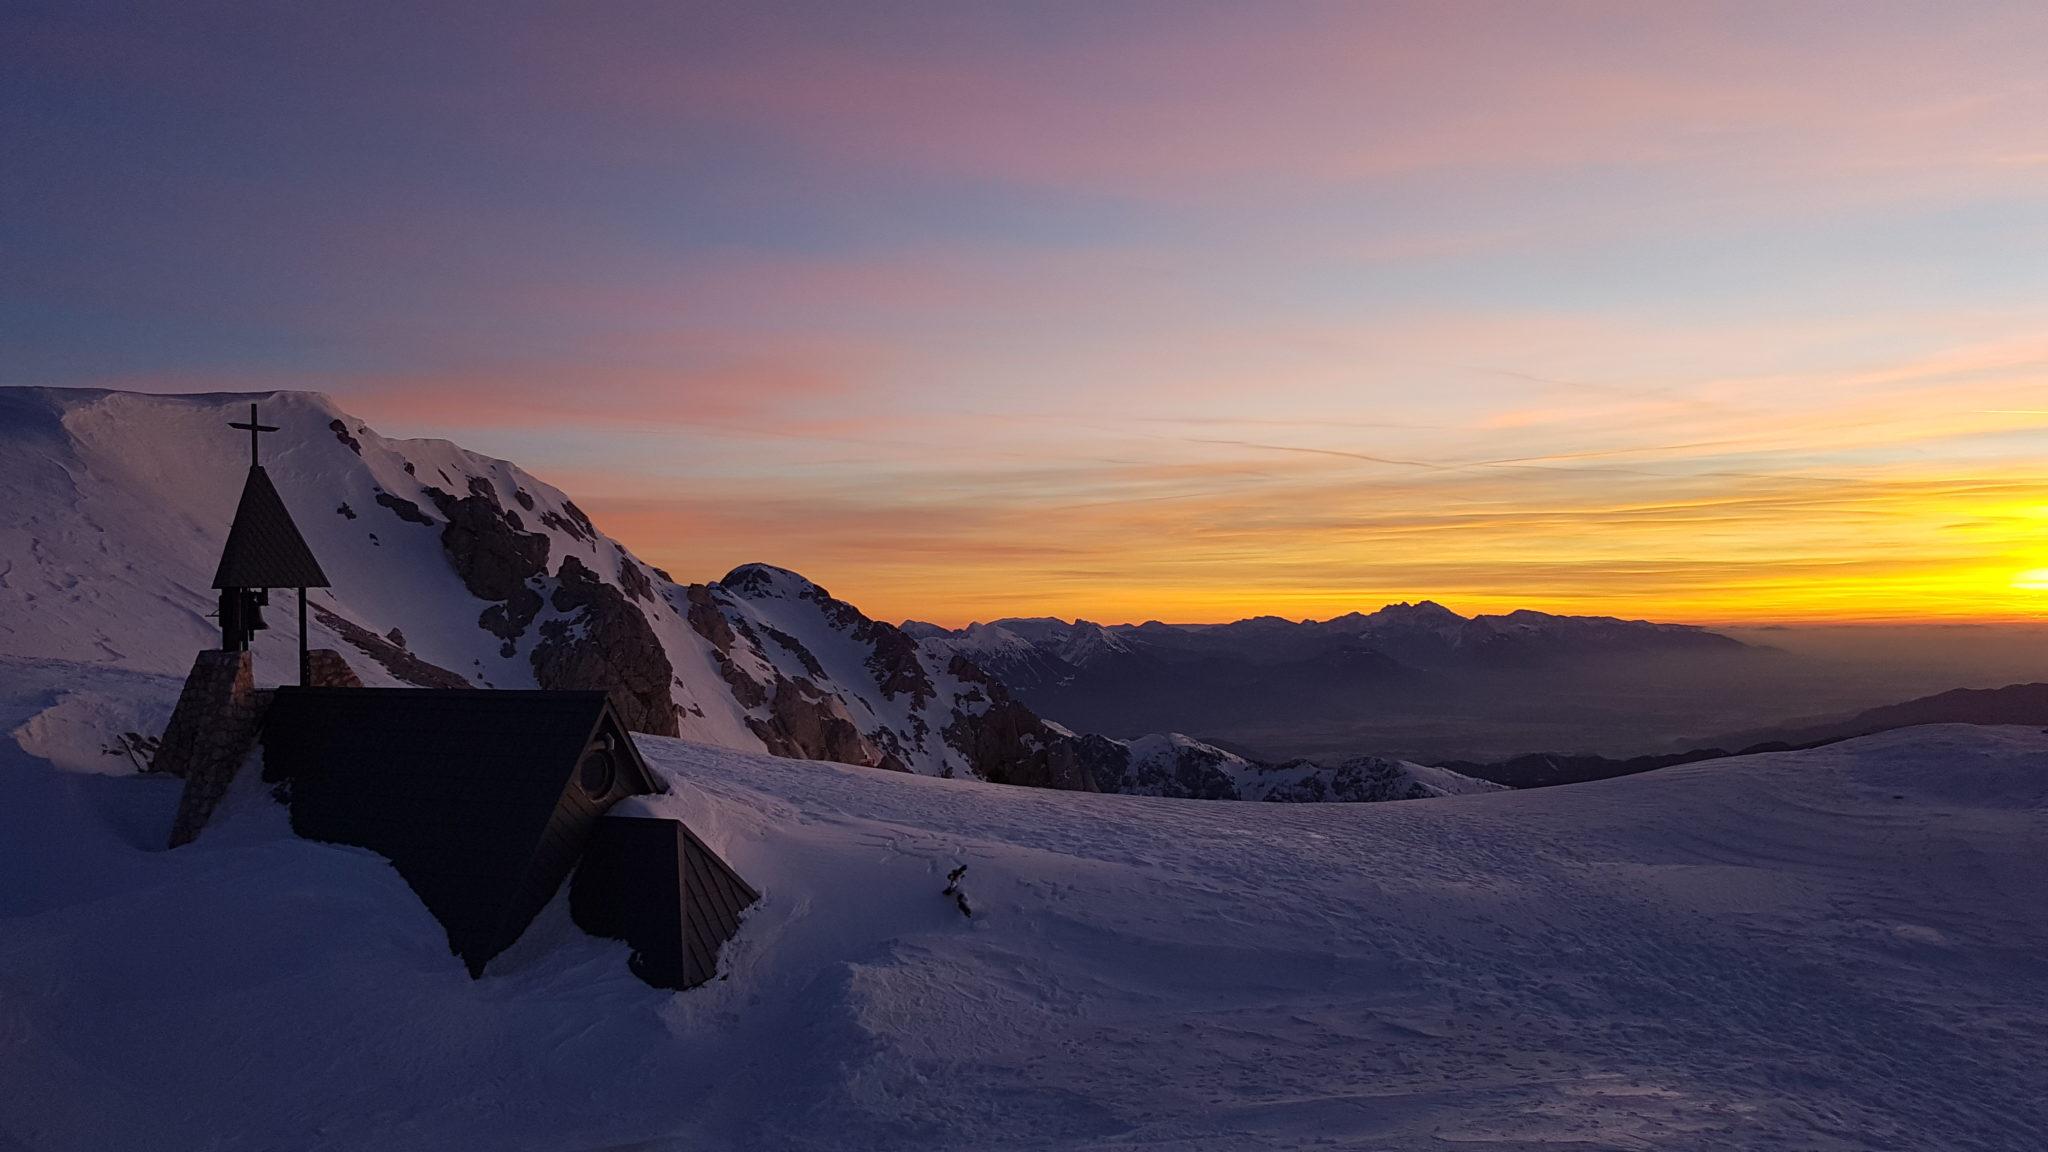 Kredarica for sunrise, Julian Alps, Triglav, Slovenia